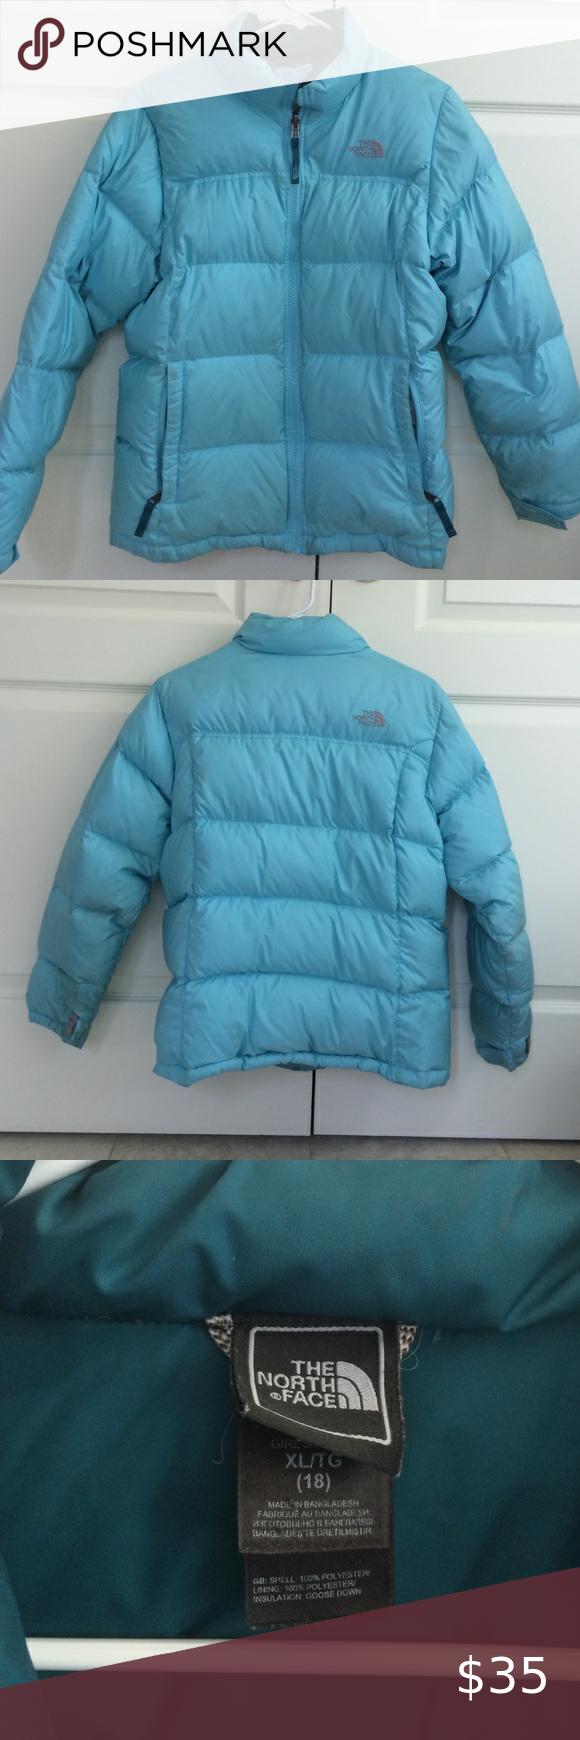 North Face Jacket Winter Girls Size Xl 18 Winter Jacket North Face North Face Jacket Pink North Face Jacket [ 1740 x 580 Pixel ]